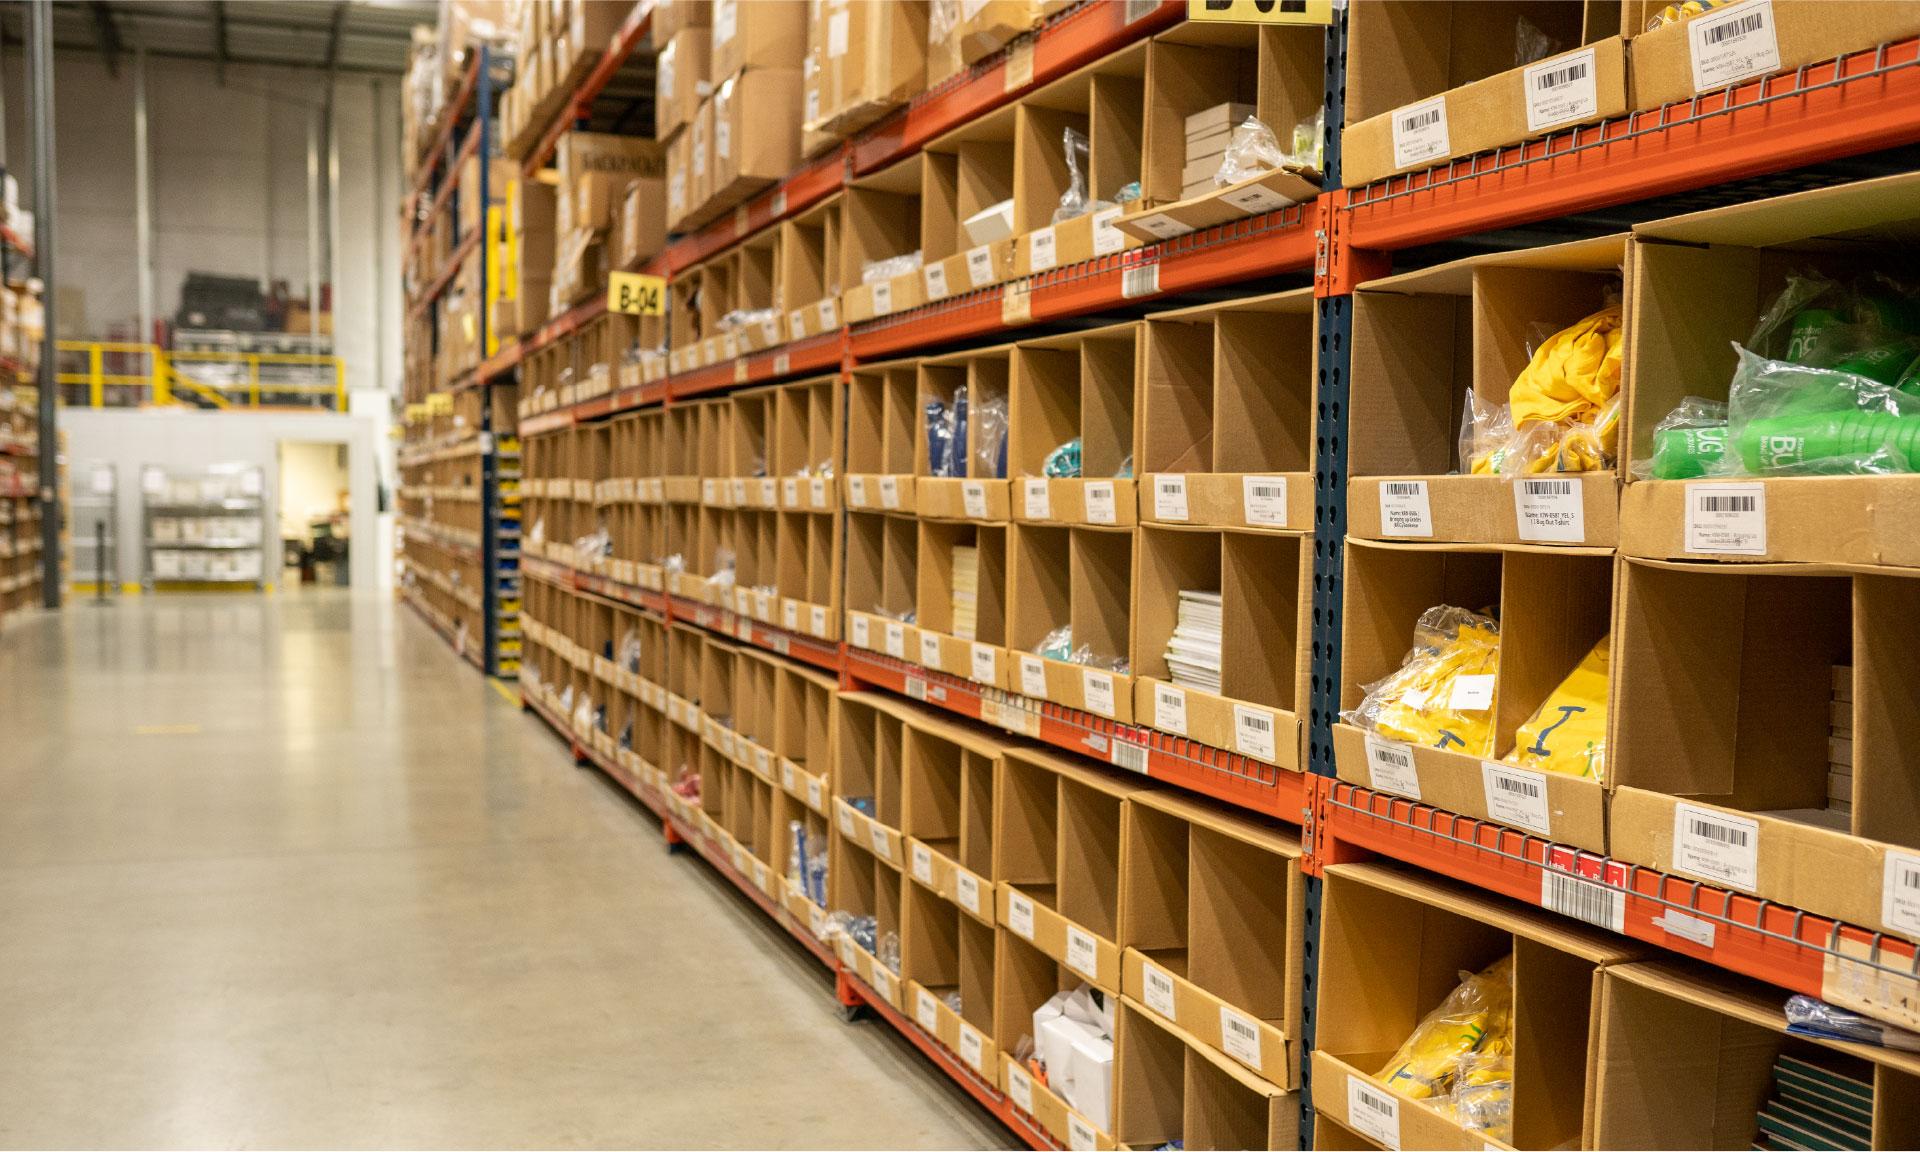 barstool sports warehouse and fulfillment